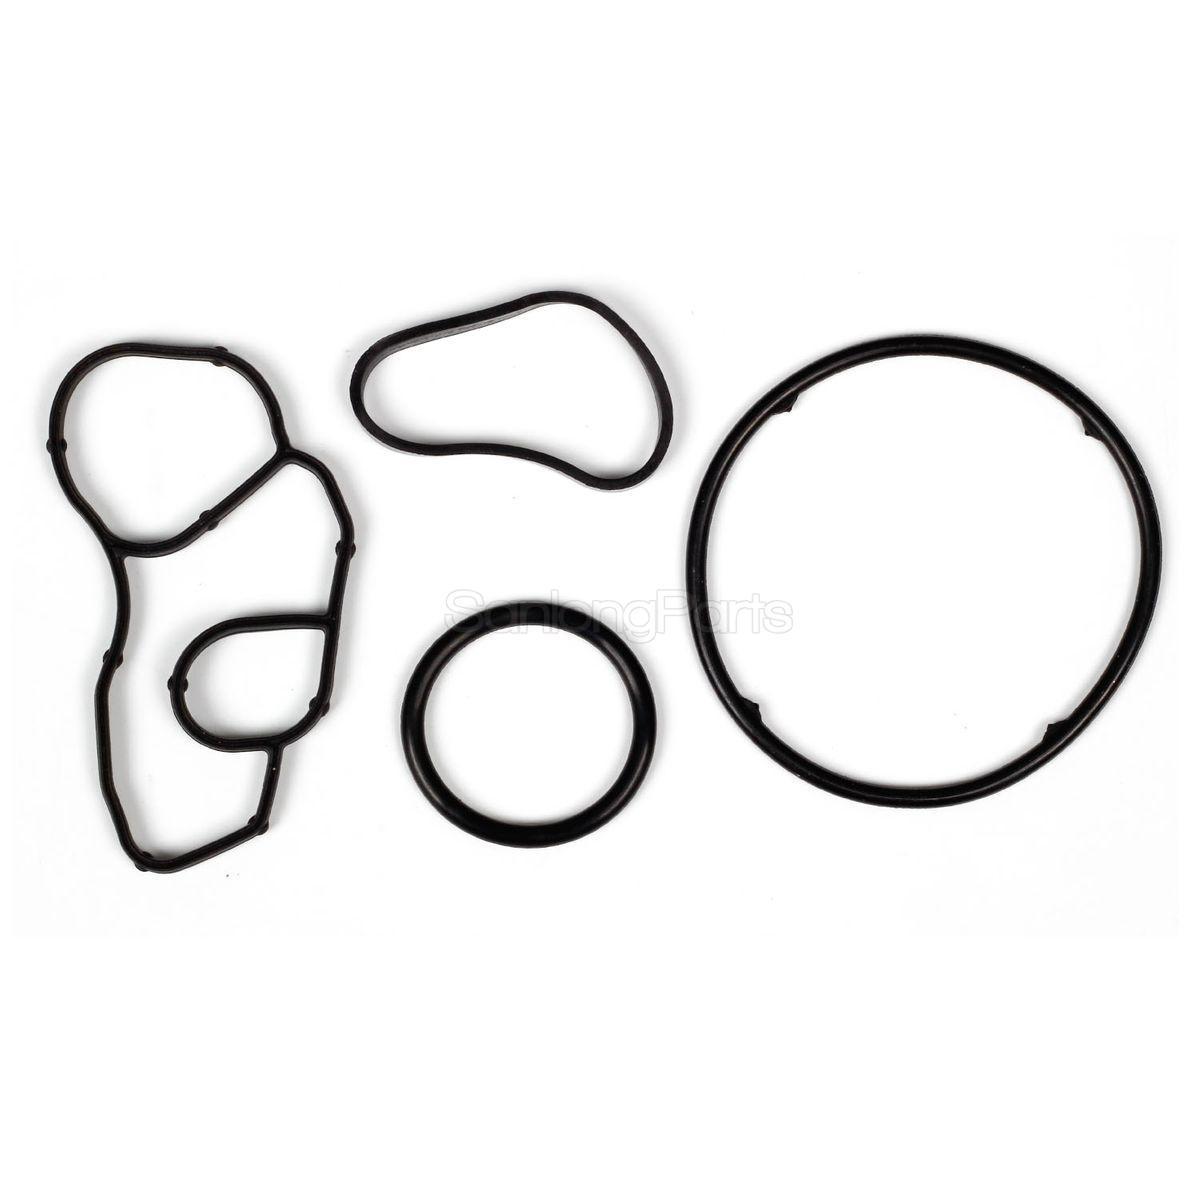 For Mini Cooper R55 R56 07 12 Cylinder Head Gasket Kit 1